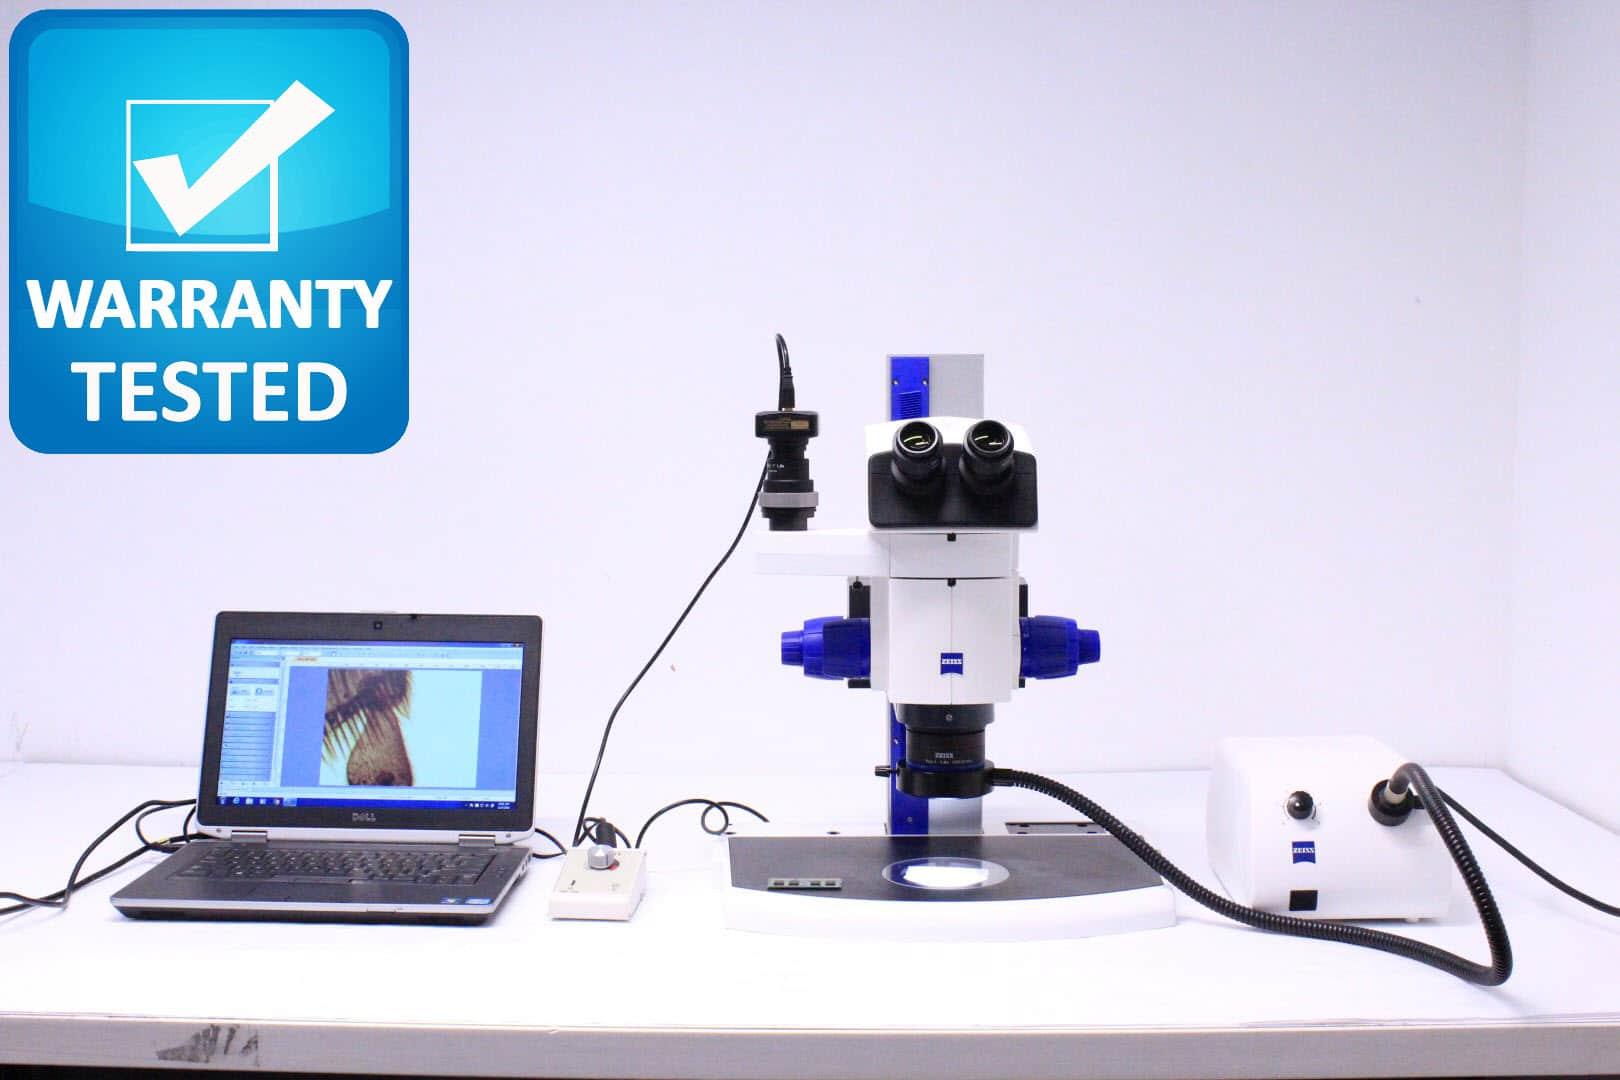 Zeiss Discovery.V8 Stereo Microscope Stereoscope